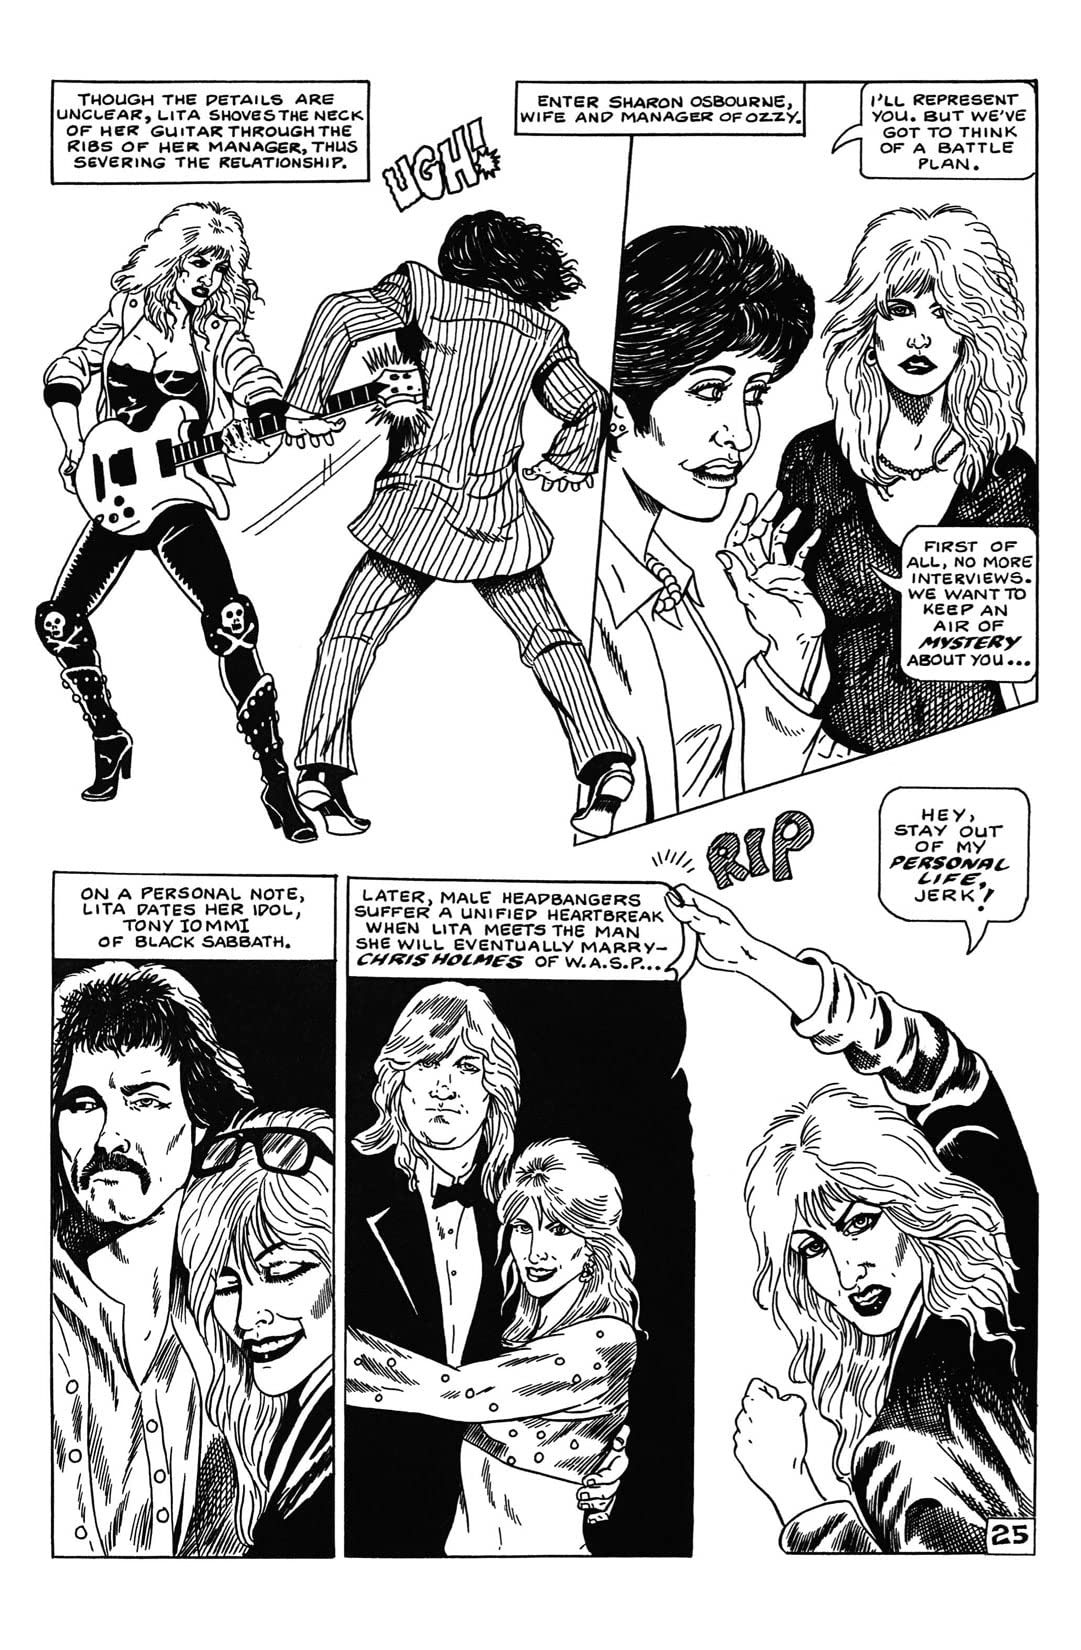 Rock N Roll Comics: Joan Jett